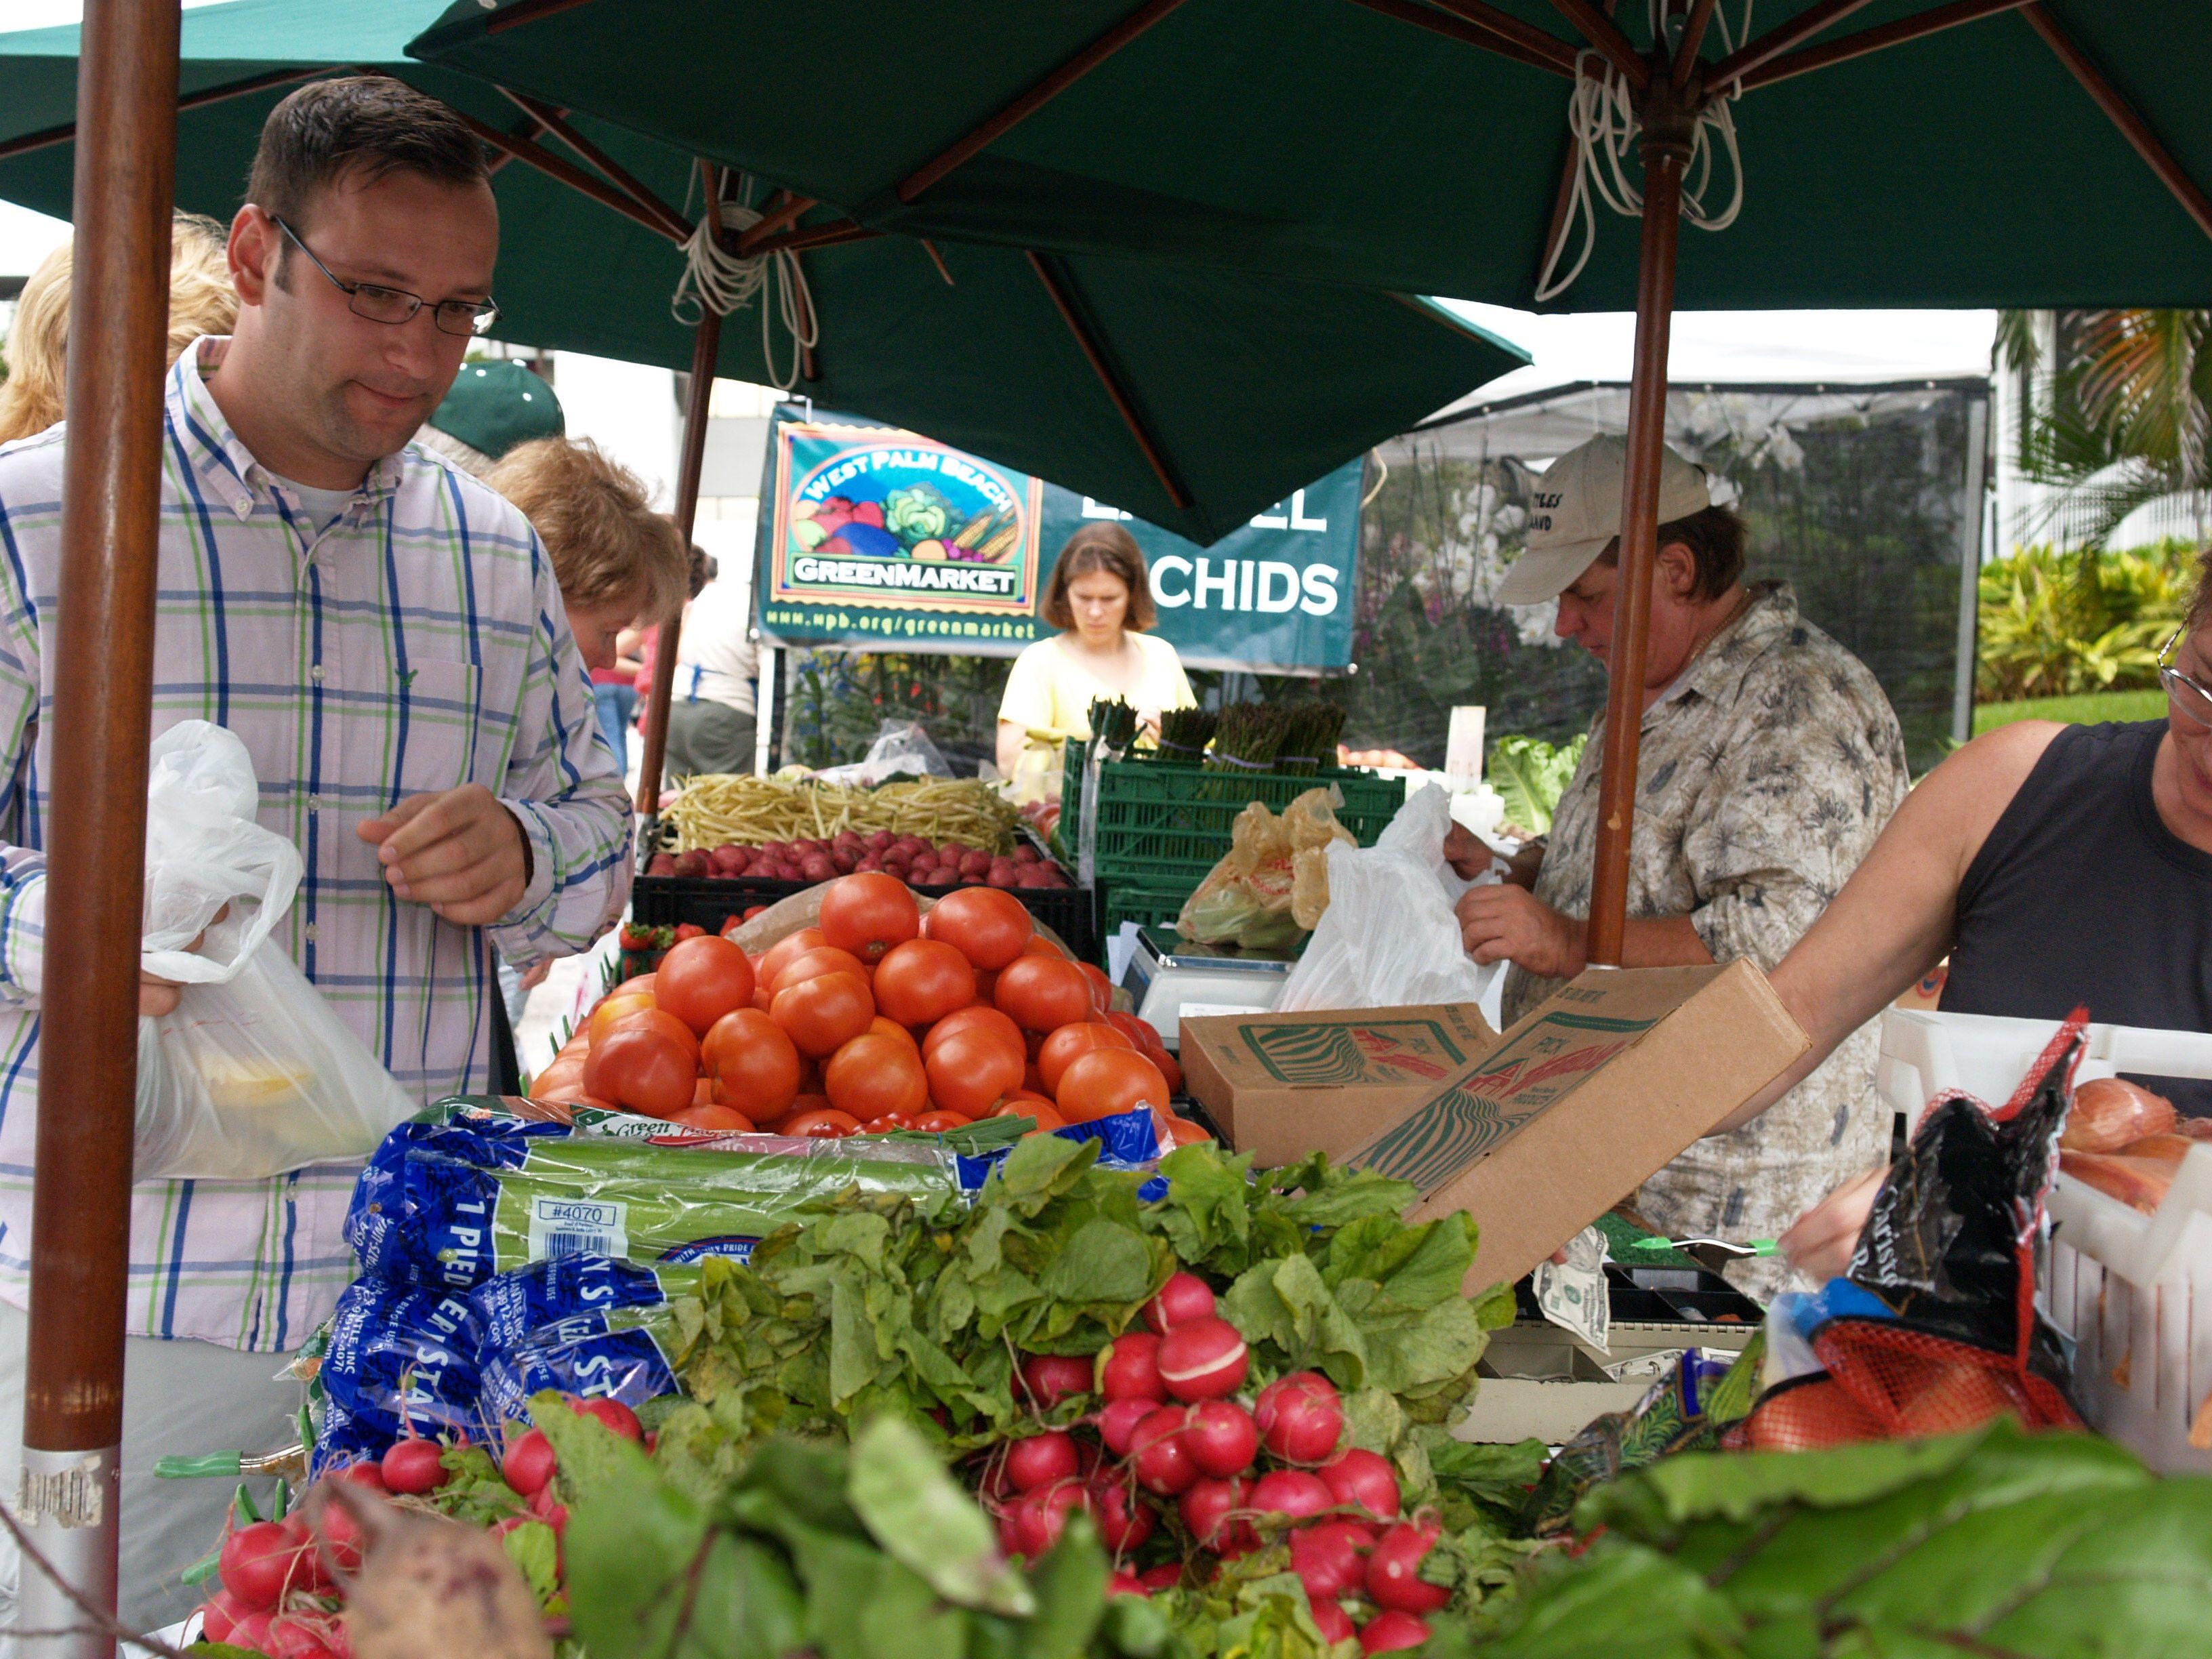 Get Local Grown Produce At The Greenmarket Greenmarket Julie Brown Merryman West Palm Beach West Palm Beach Palm Beach Beach